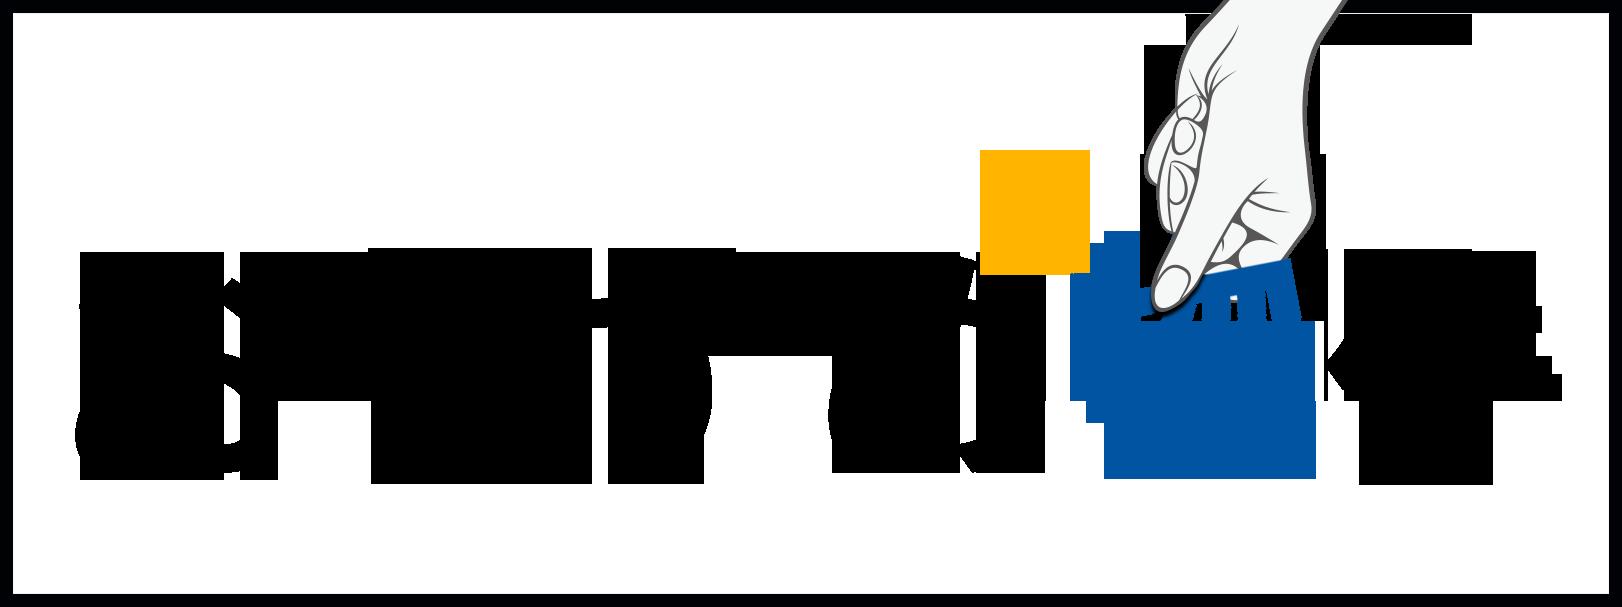 susumebanner